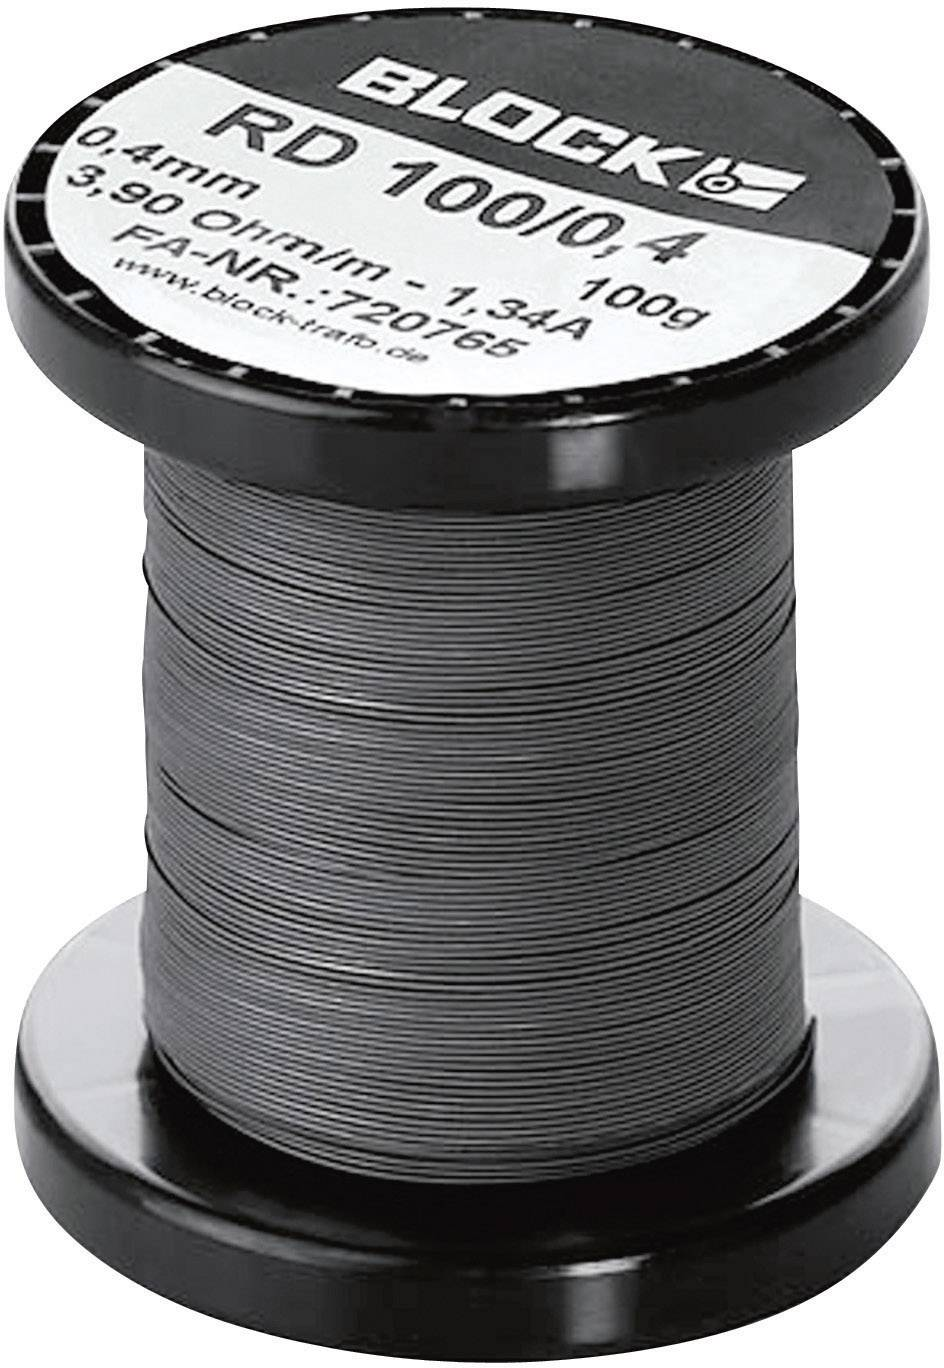 Odporový drát (konstantan) Block RD 100/0,4, 3.9 Ω/m, 89 m